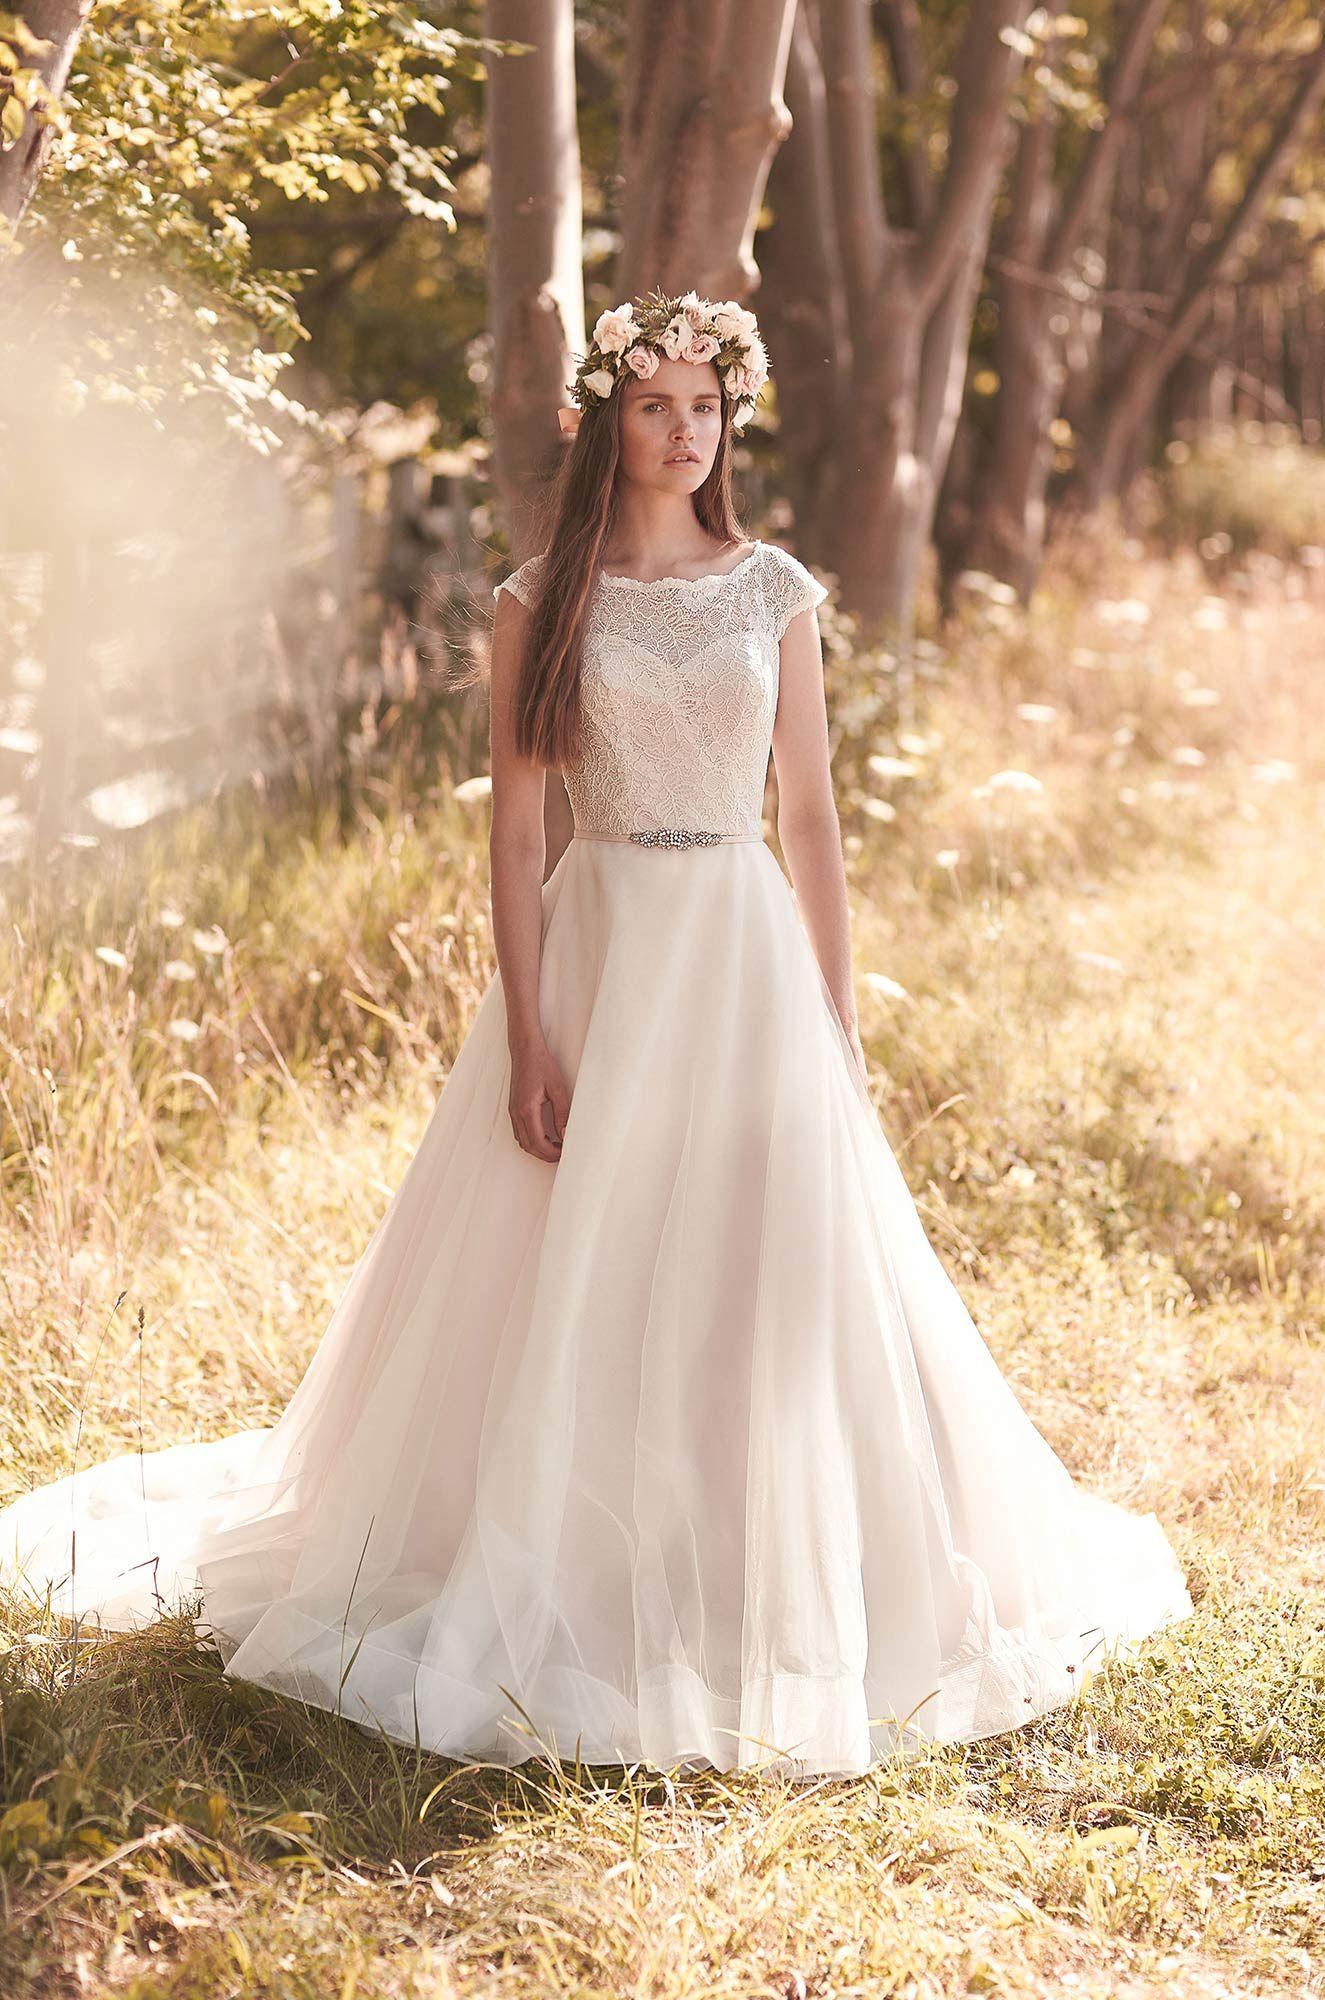 Full tulle skirt wedding dress style in future